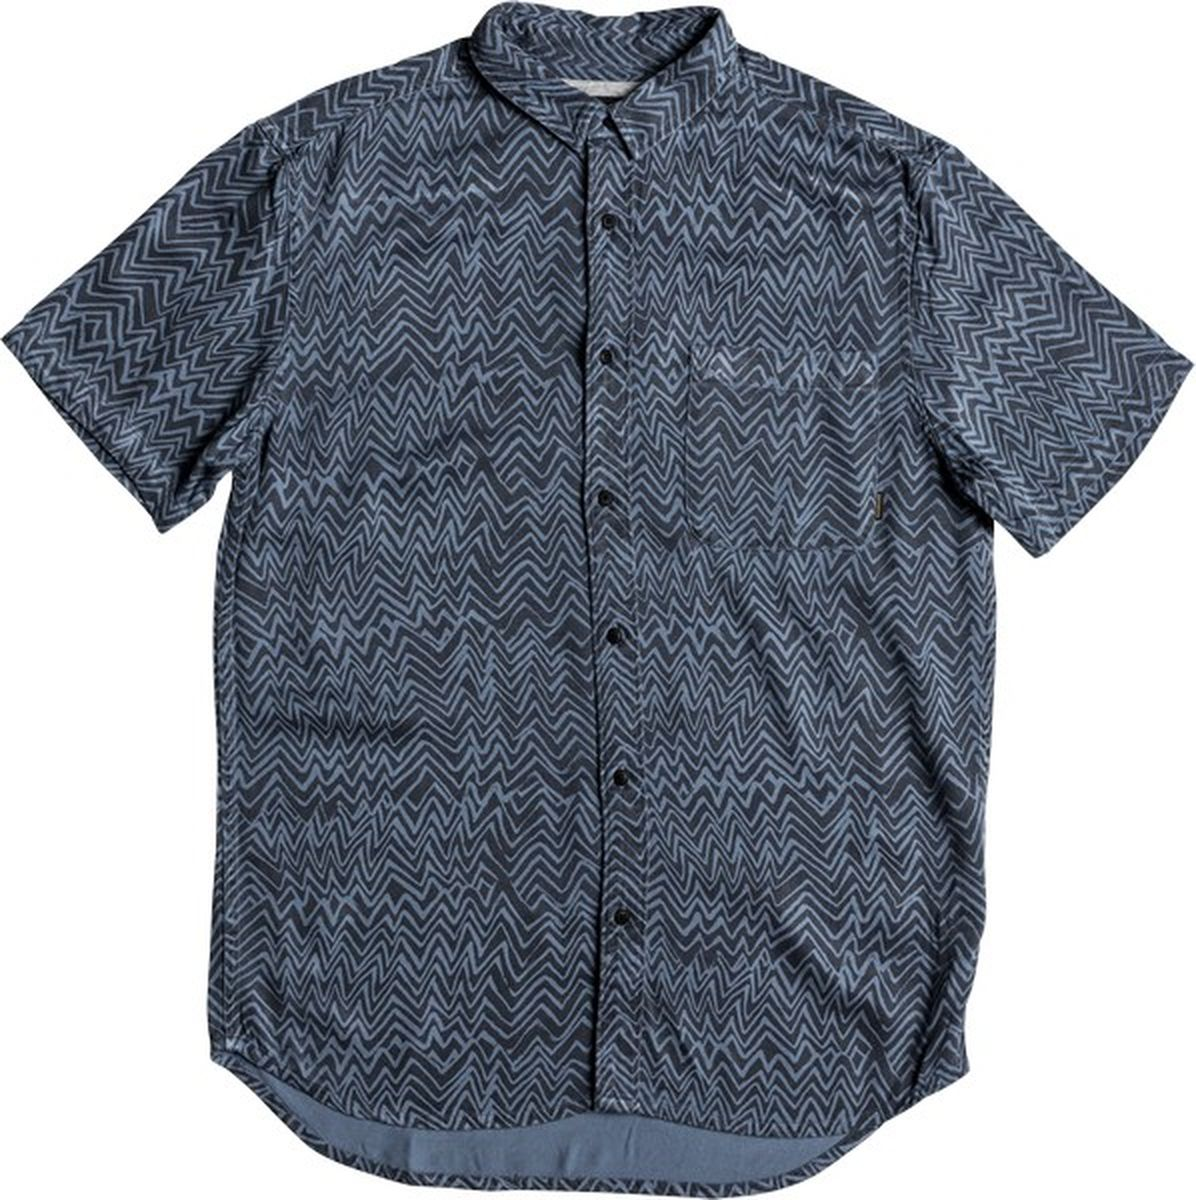 Рубашка мужская Quiksilver, цвет: синий. EQYWT03649-BPR6. Размер  (50)